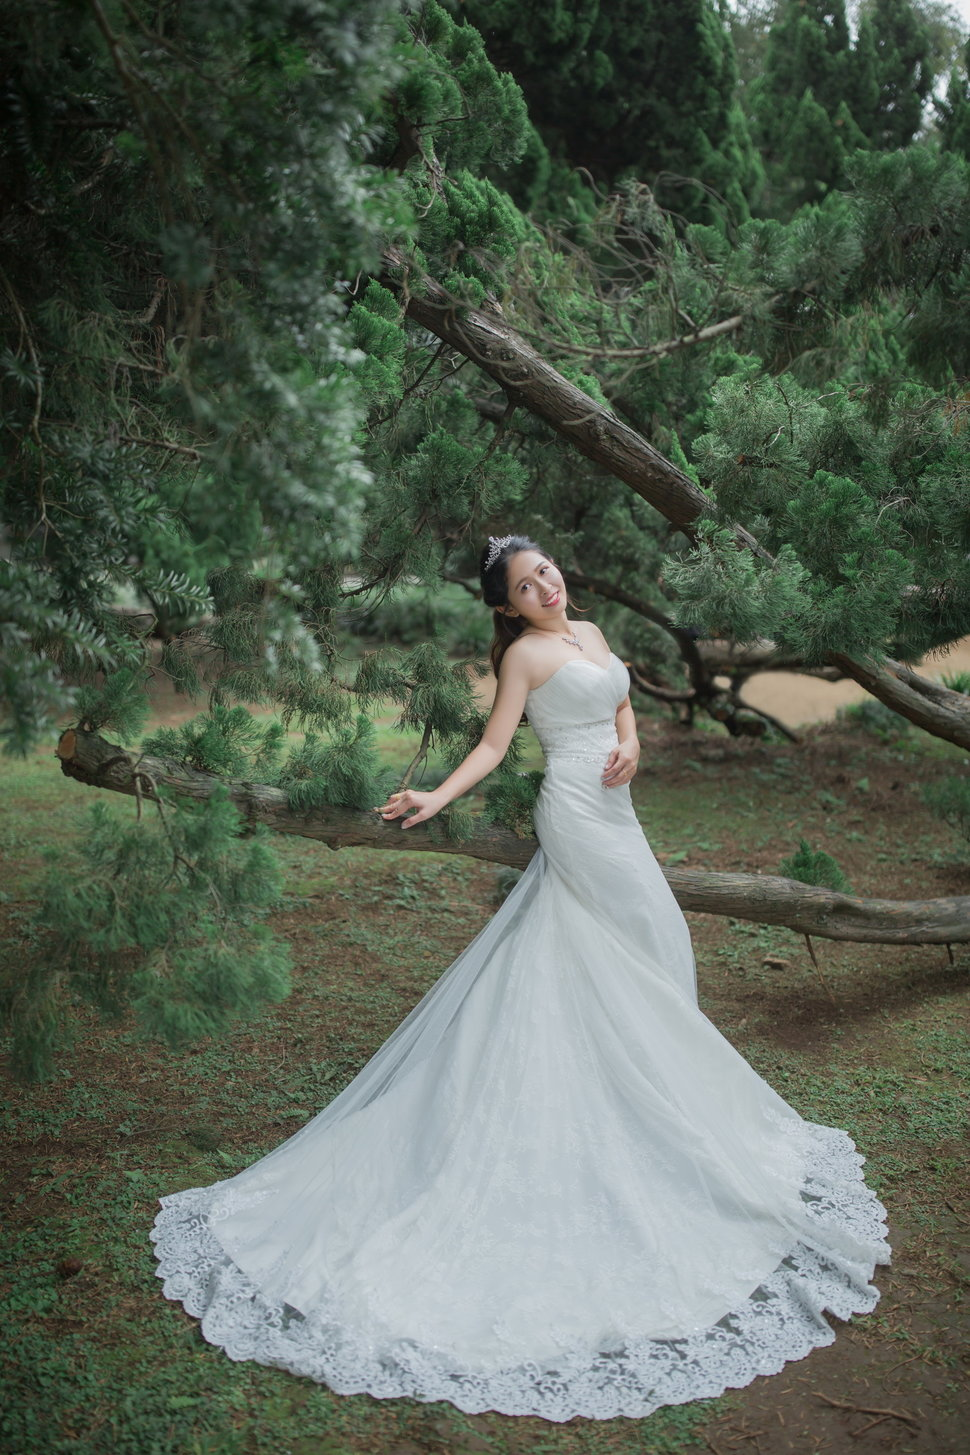 PP-0304_調整大小 - 巴黎婚紗攝影台灣總店《結婚吧》